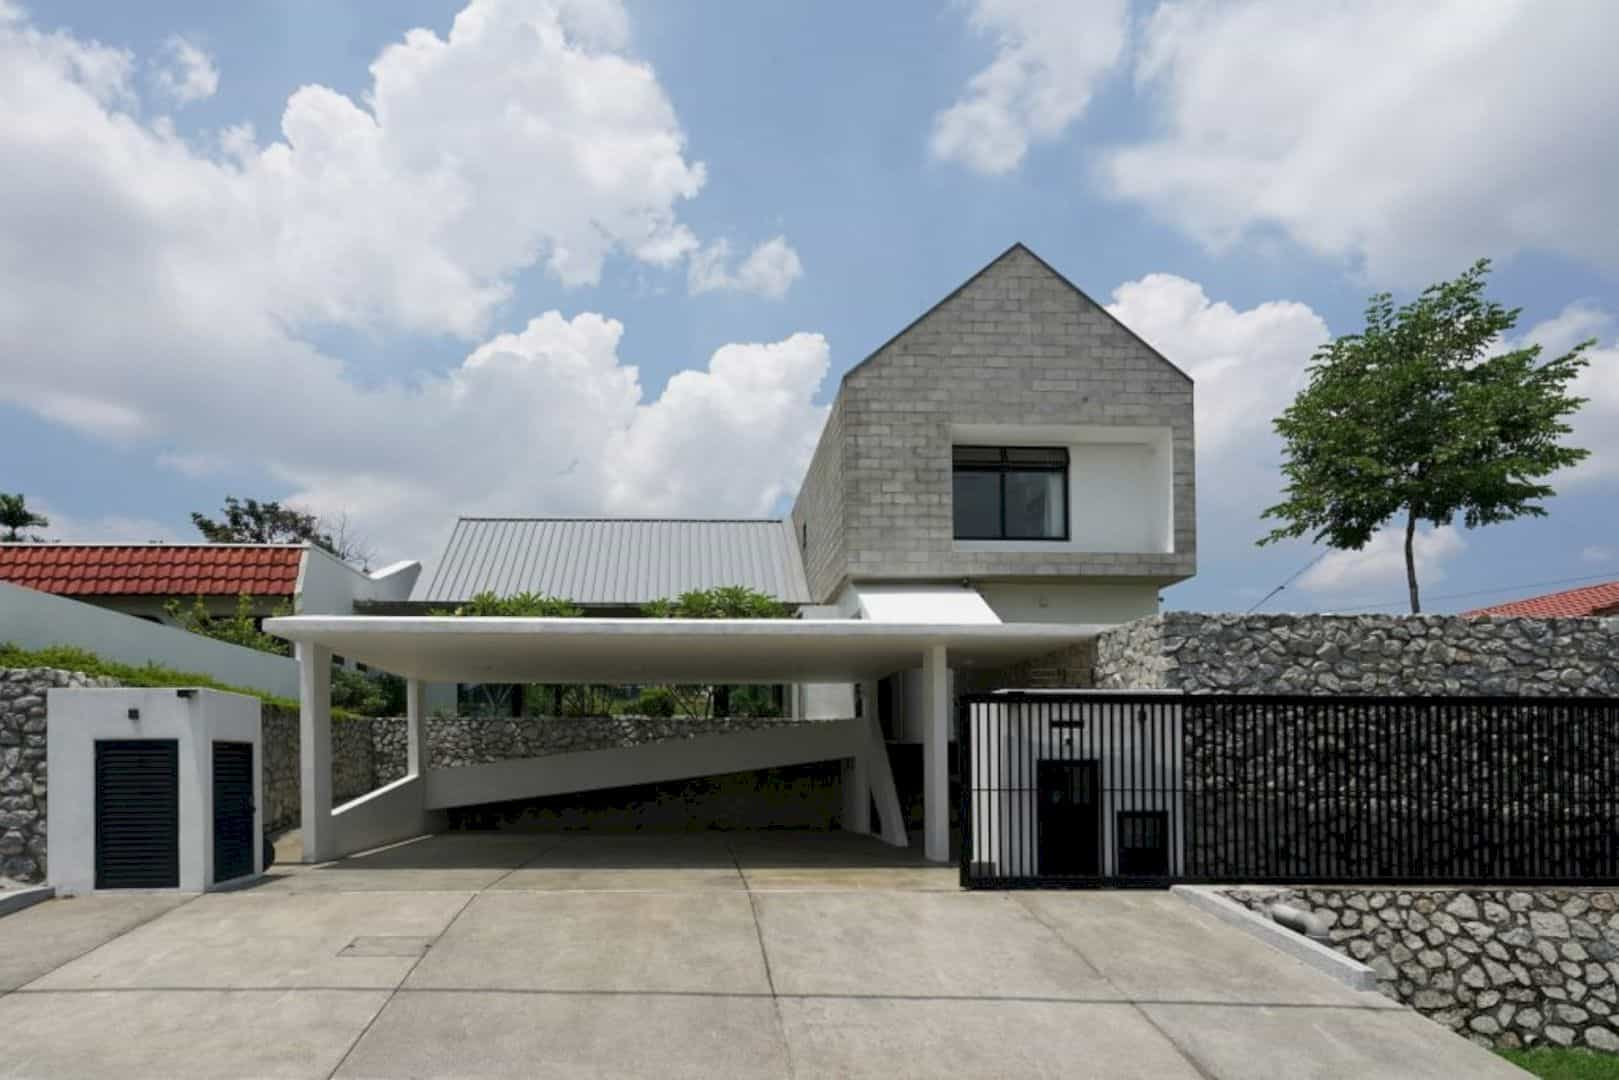 Knikno House: Modern Interpretation of A Barn House ...